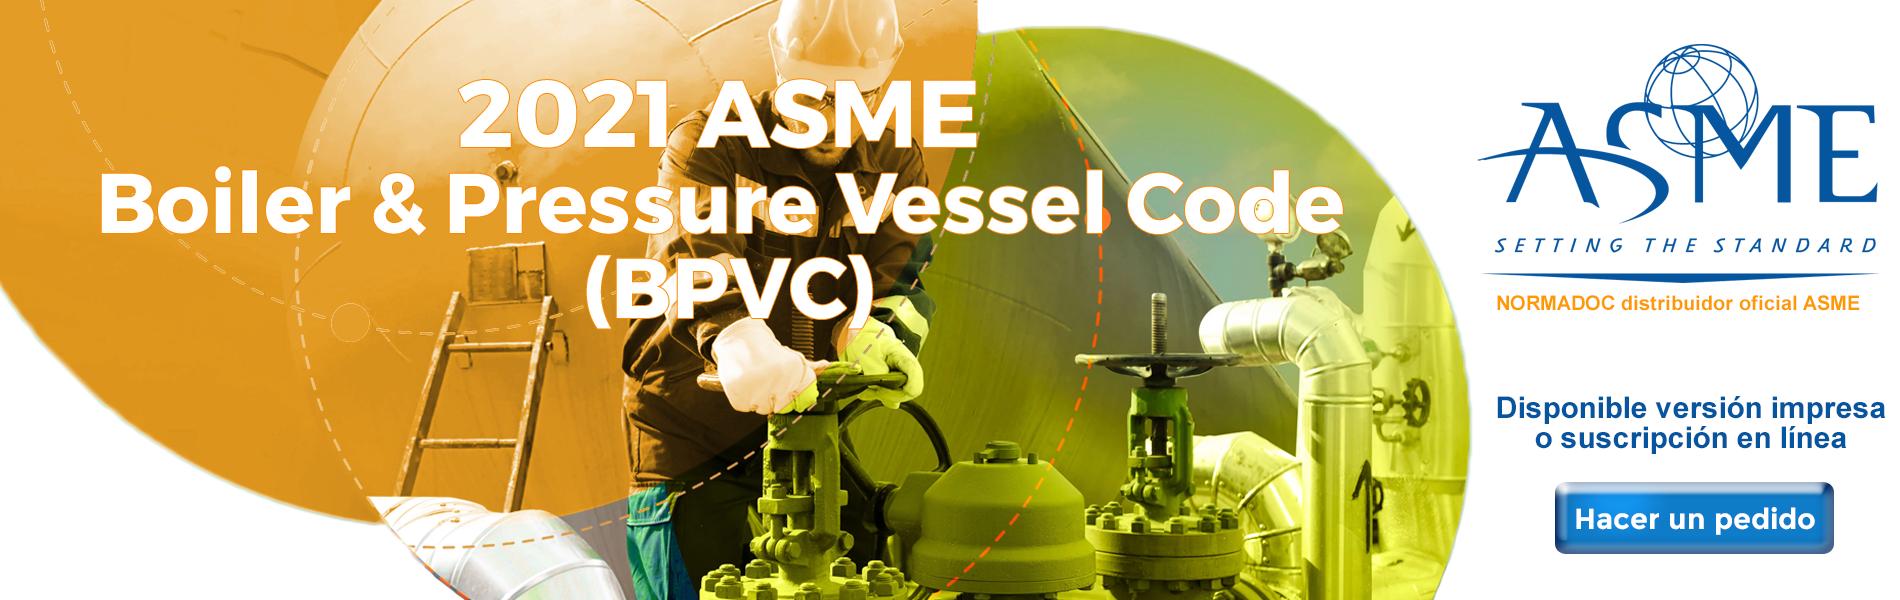 Bandeau ASME BPVC Code 2021 ES